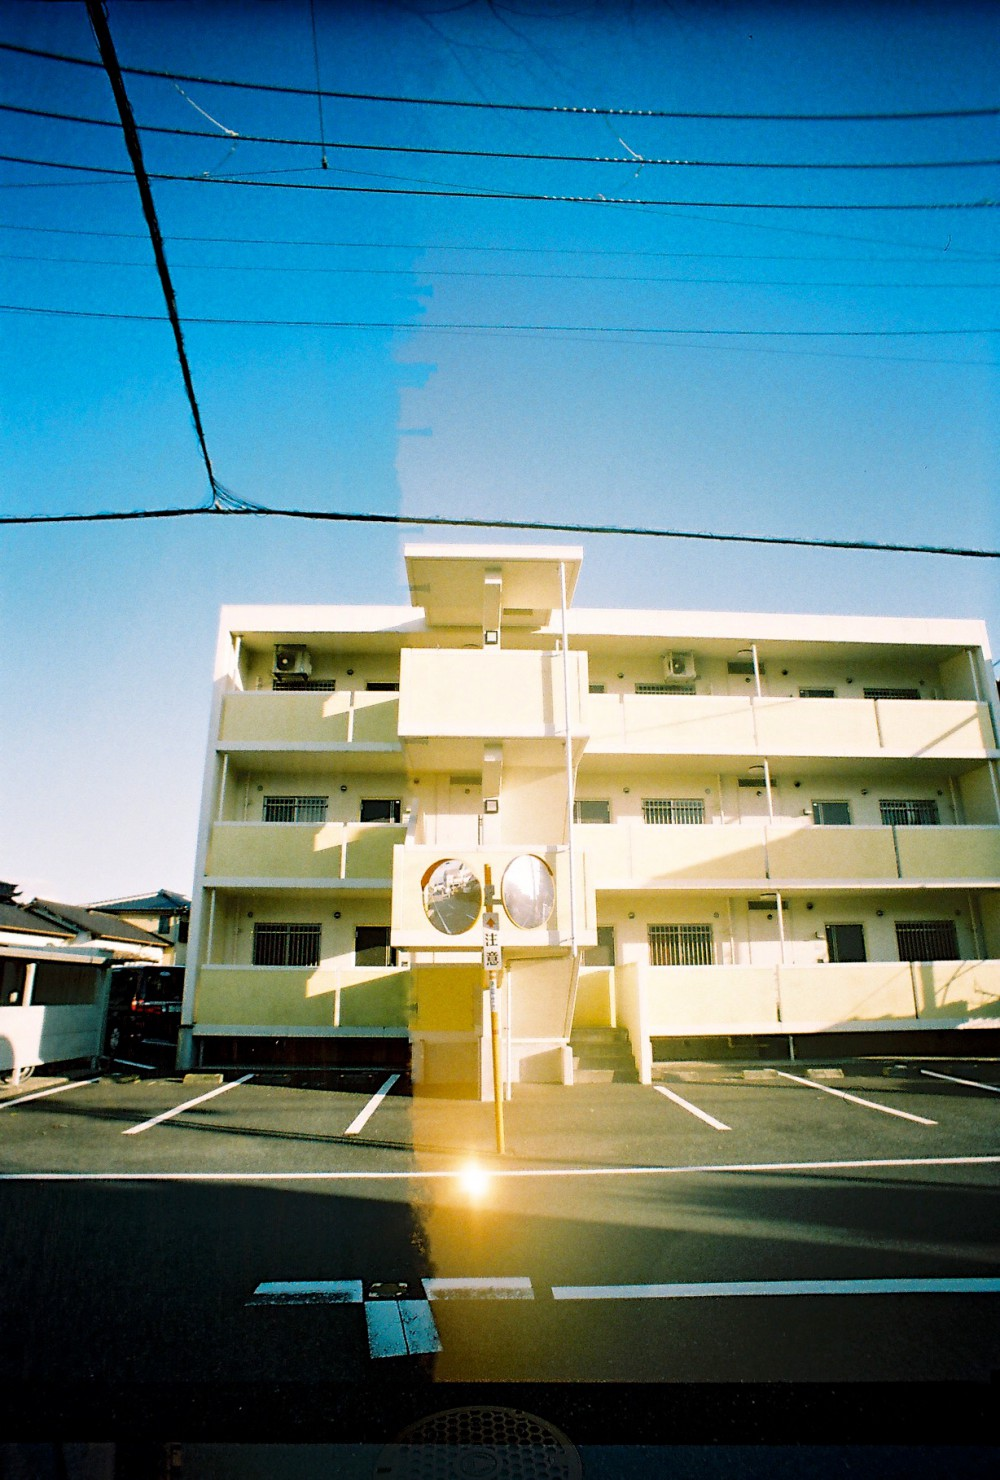 路邊的公寓樓 很有一種身處日劇的感覺 命案現場 神探伽利略 柯南君 ええ。。。ごめん 又想入非非了